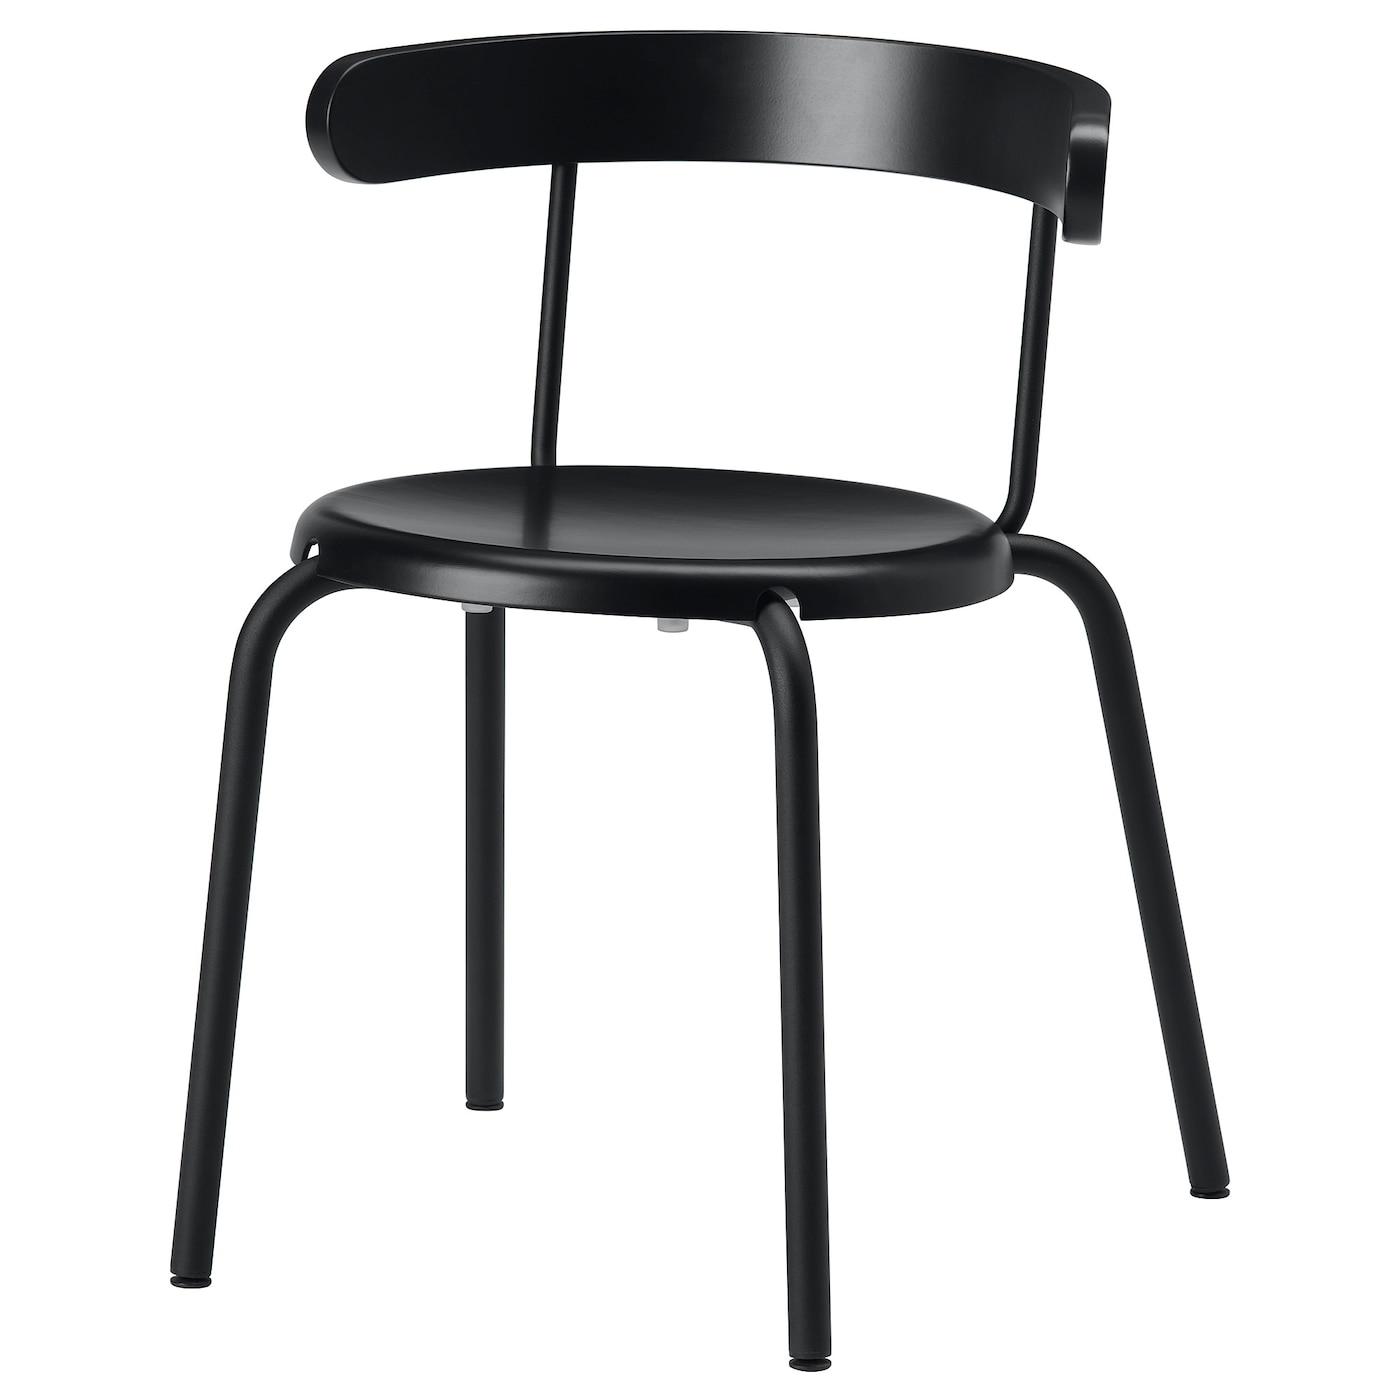 r-chair__0714279_PE730013_S5